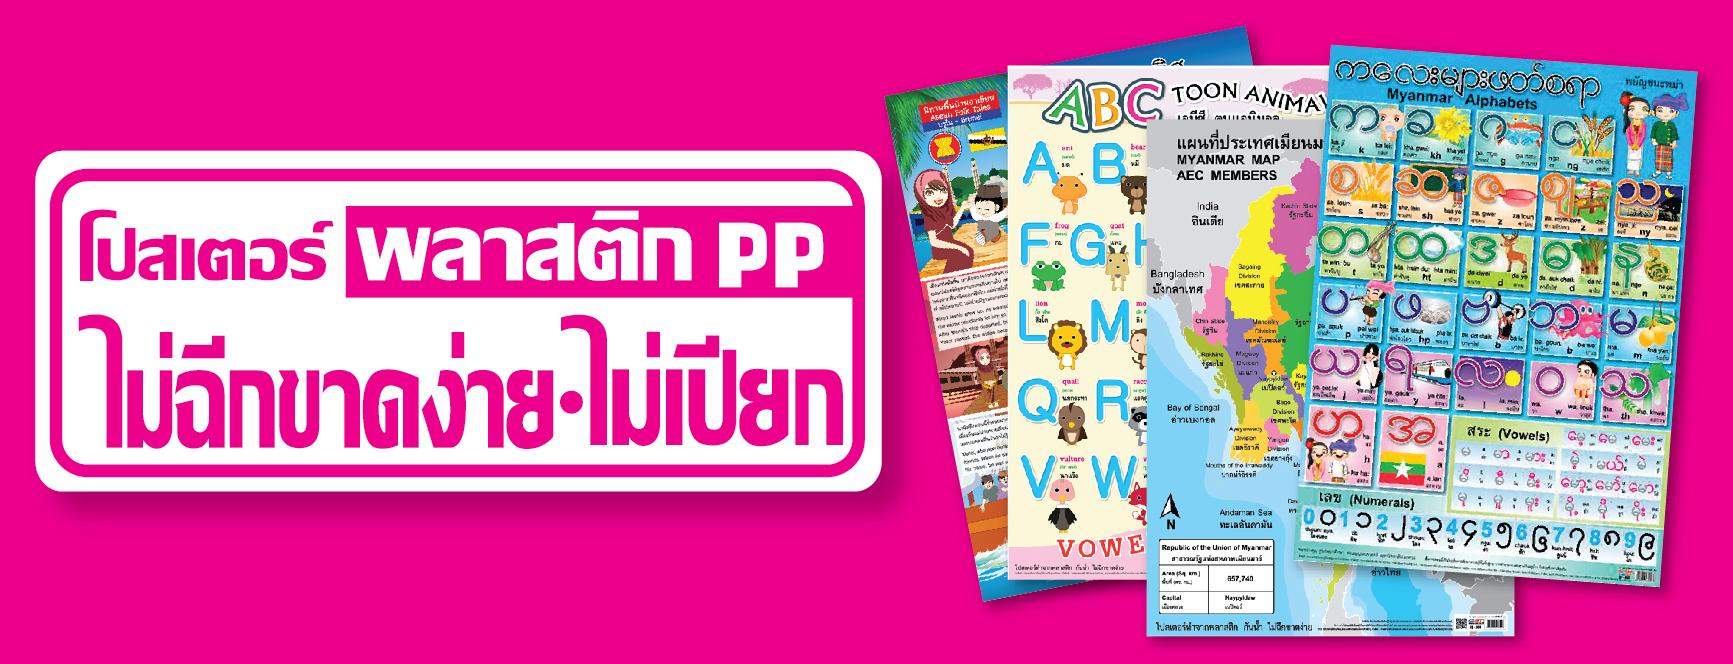 poster, plastic, education, โปสเตอร์, สื่อการสอน, พลาสติก, สื่อการศึกษา